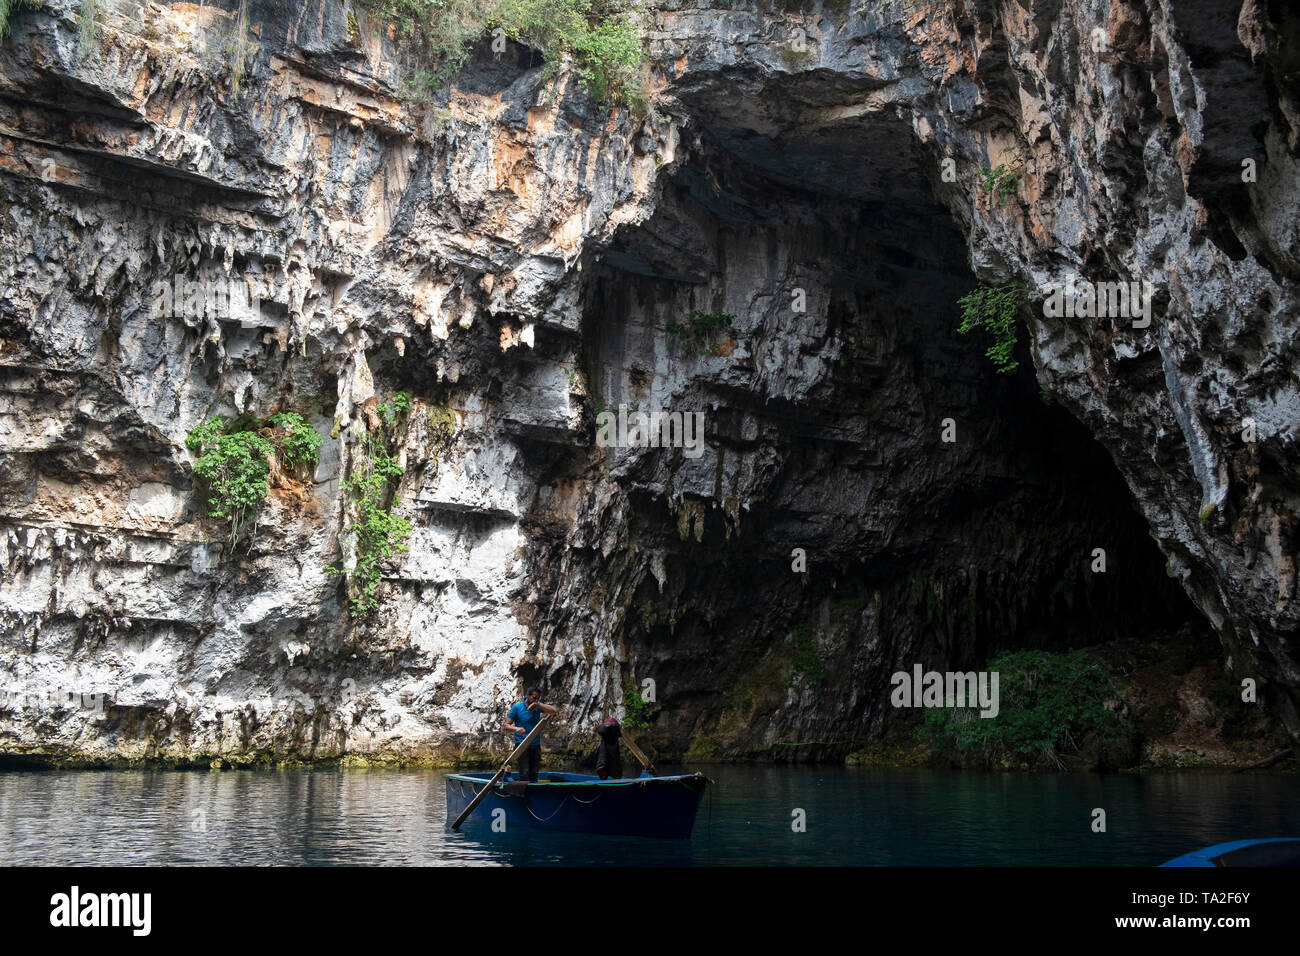 Melissani Lake near Sami, Kefalonia, Greece. Kefalonia is an island in the Ionian Sea, west of mainland Greece. - Stock Image